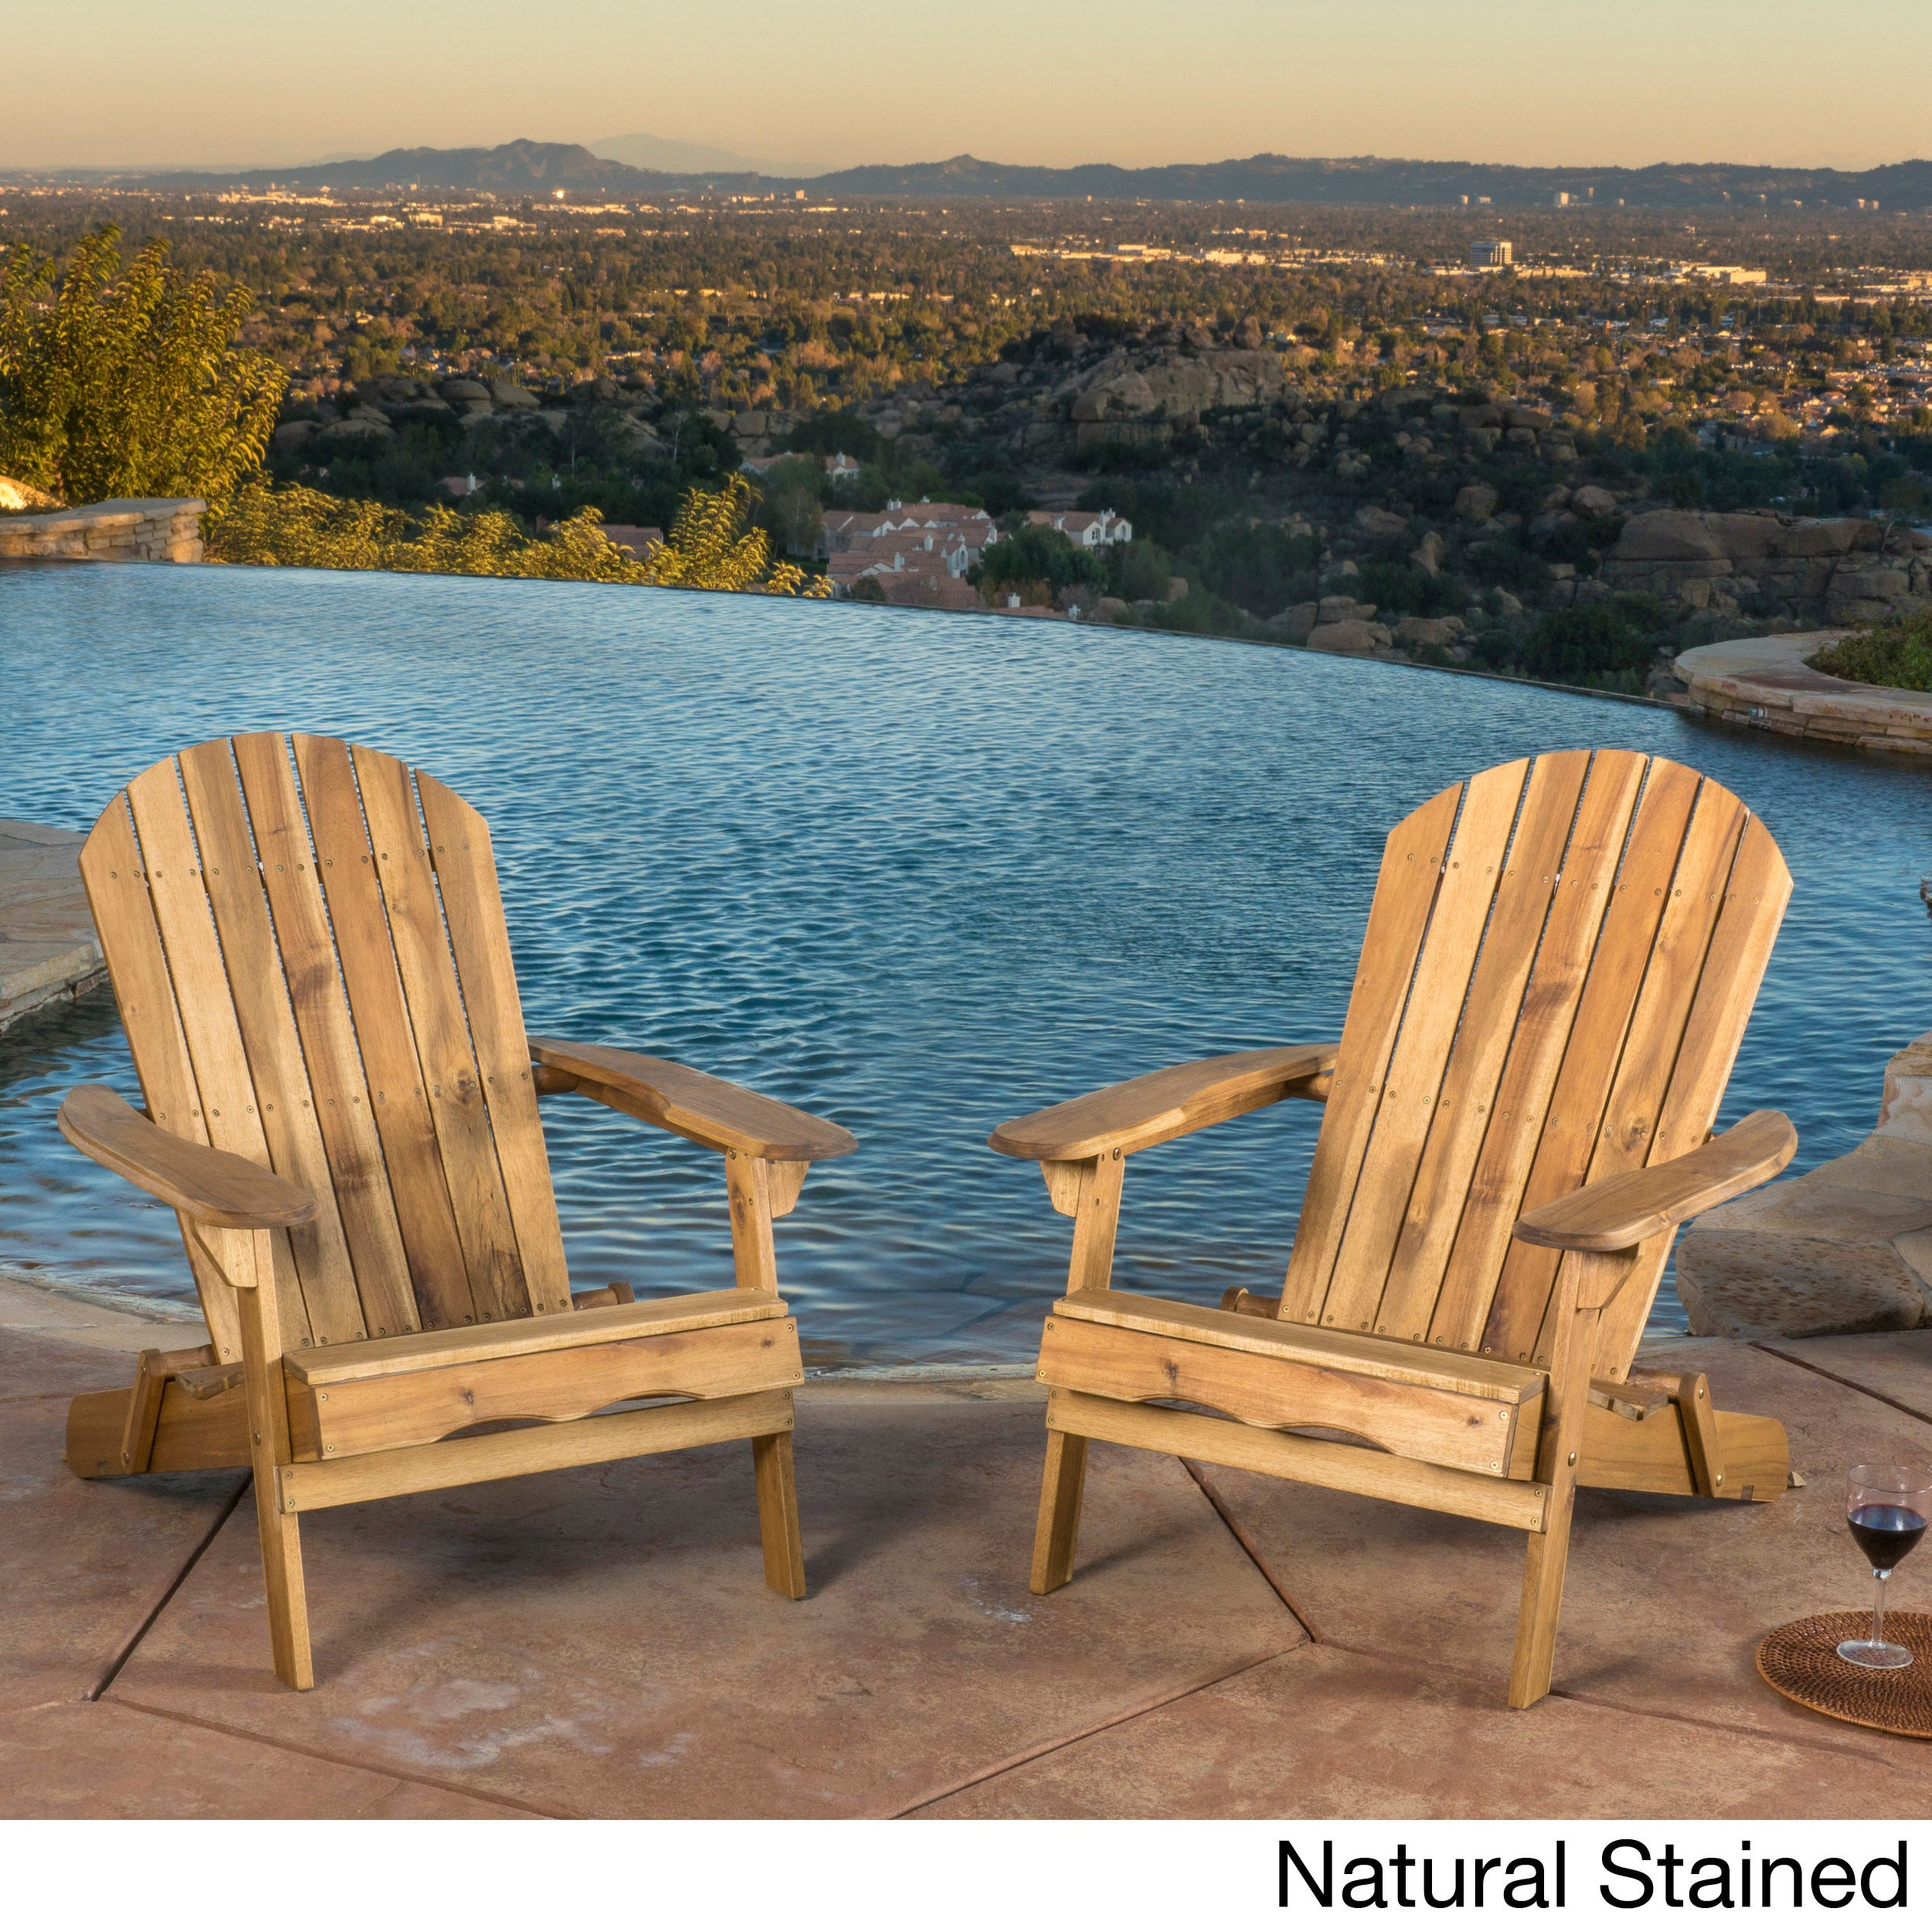 Hanlee Outdoor Folding Wood Adirondack Chair Set of 2 by